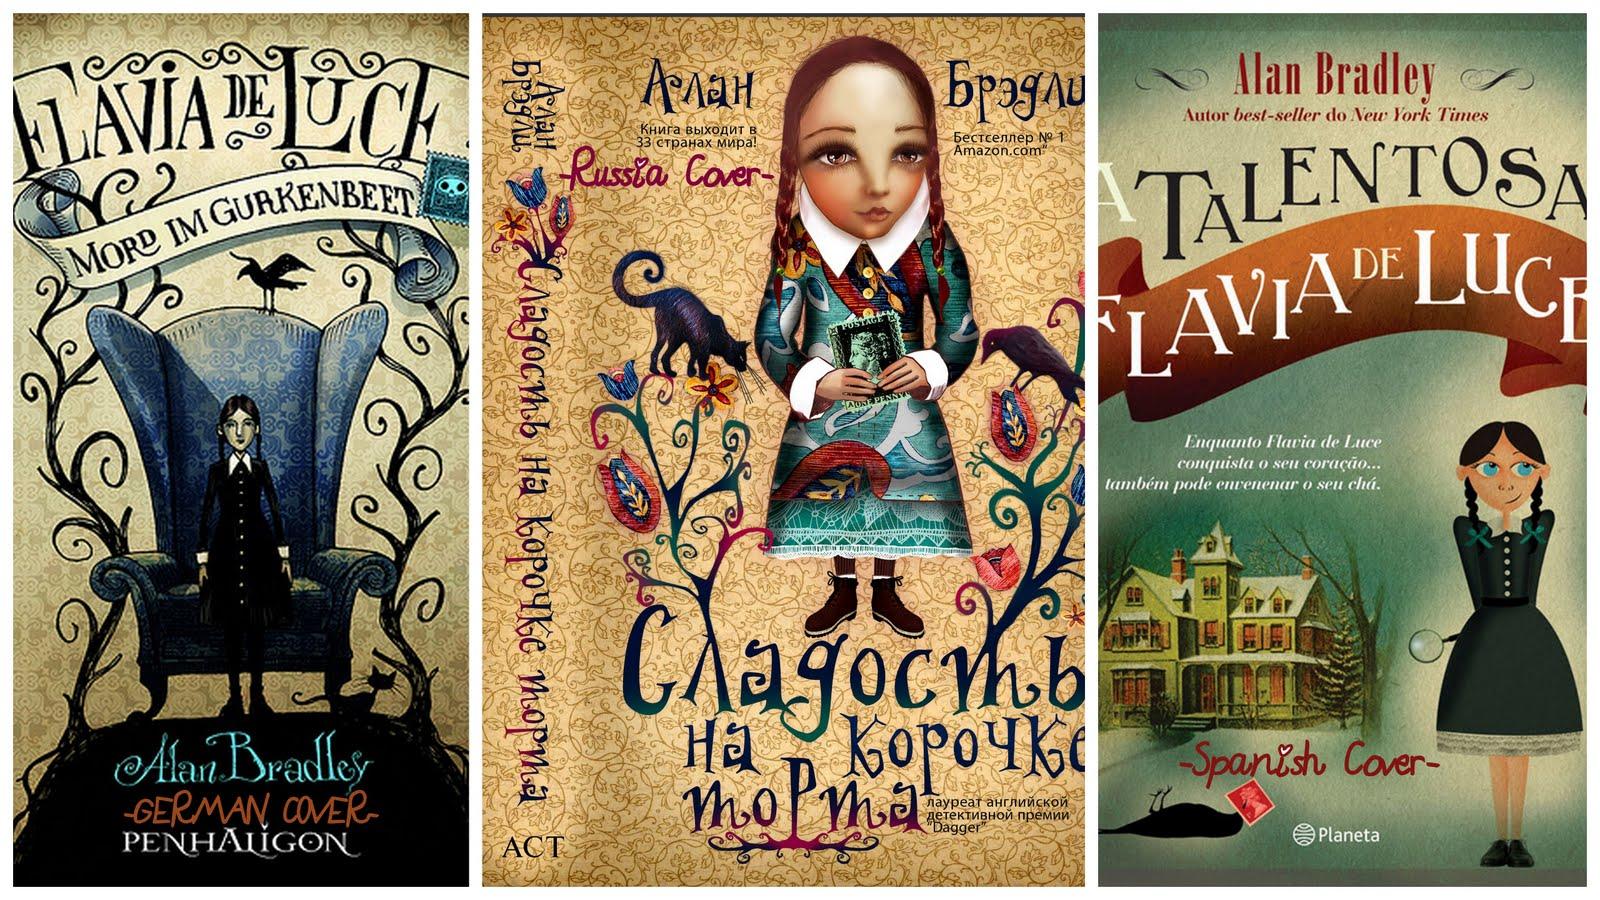 Alan Bradley Flavia de Luce books